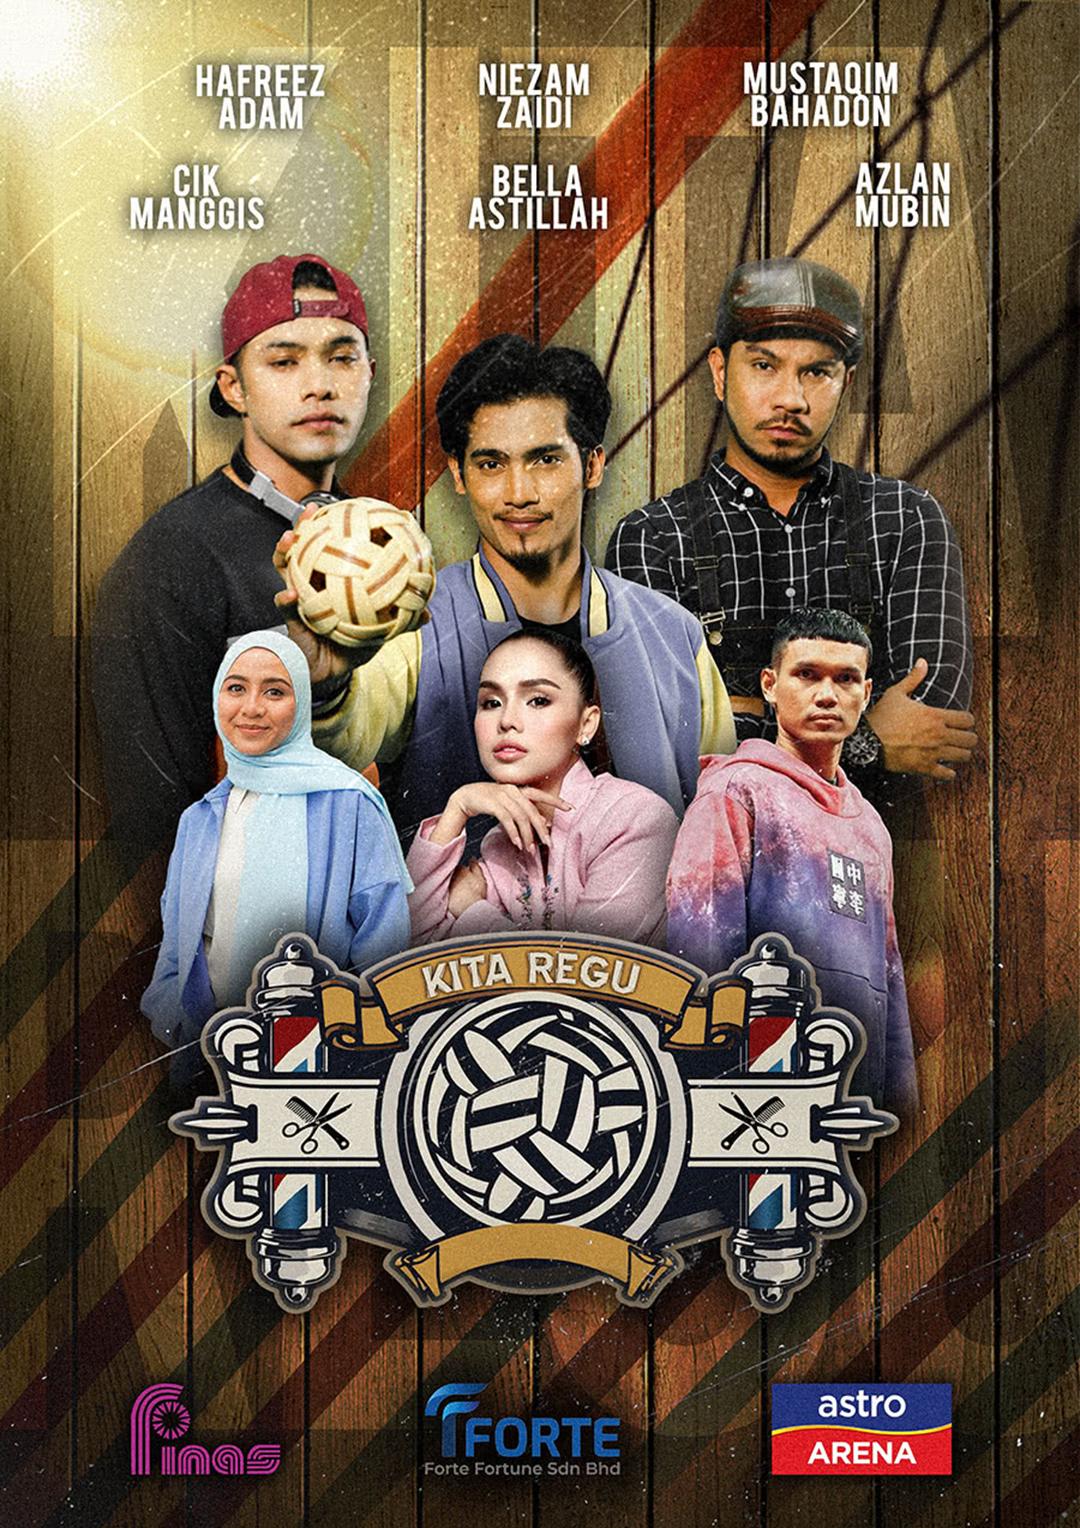 Drama Kita Regu Astro Arena